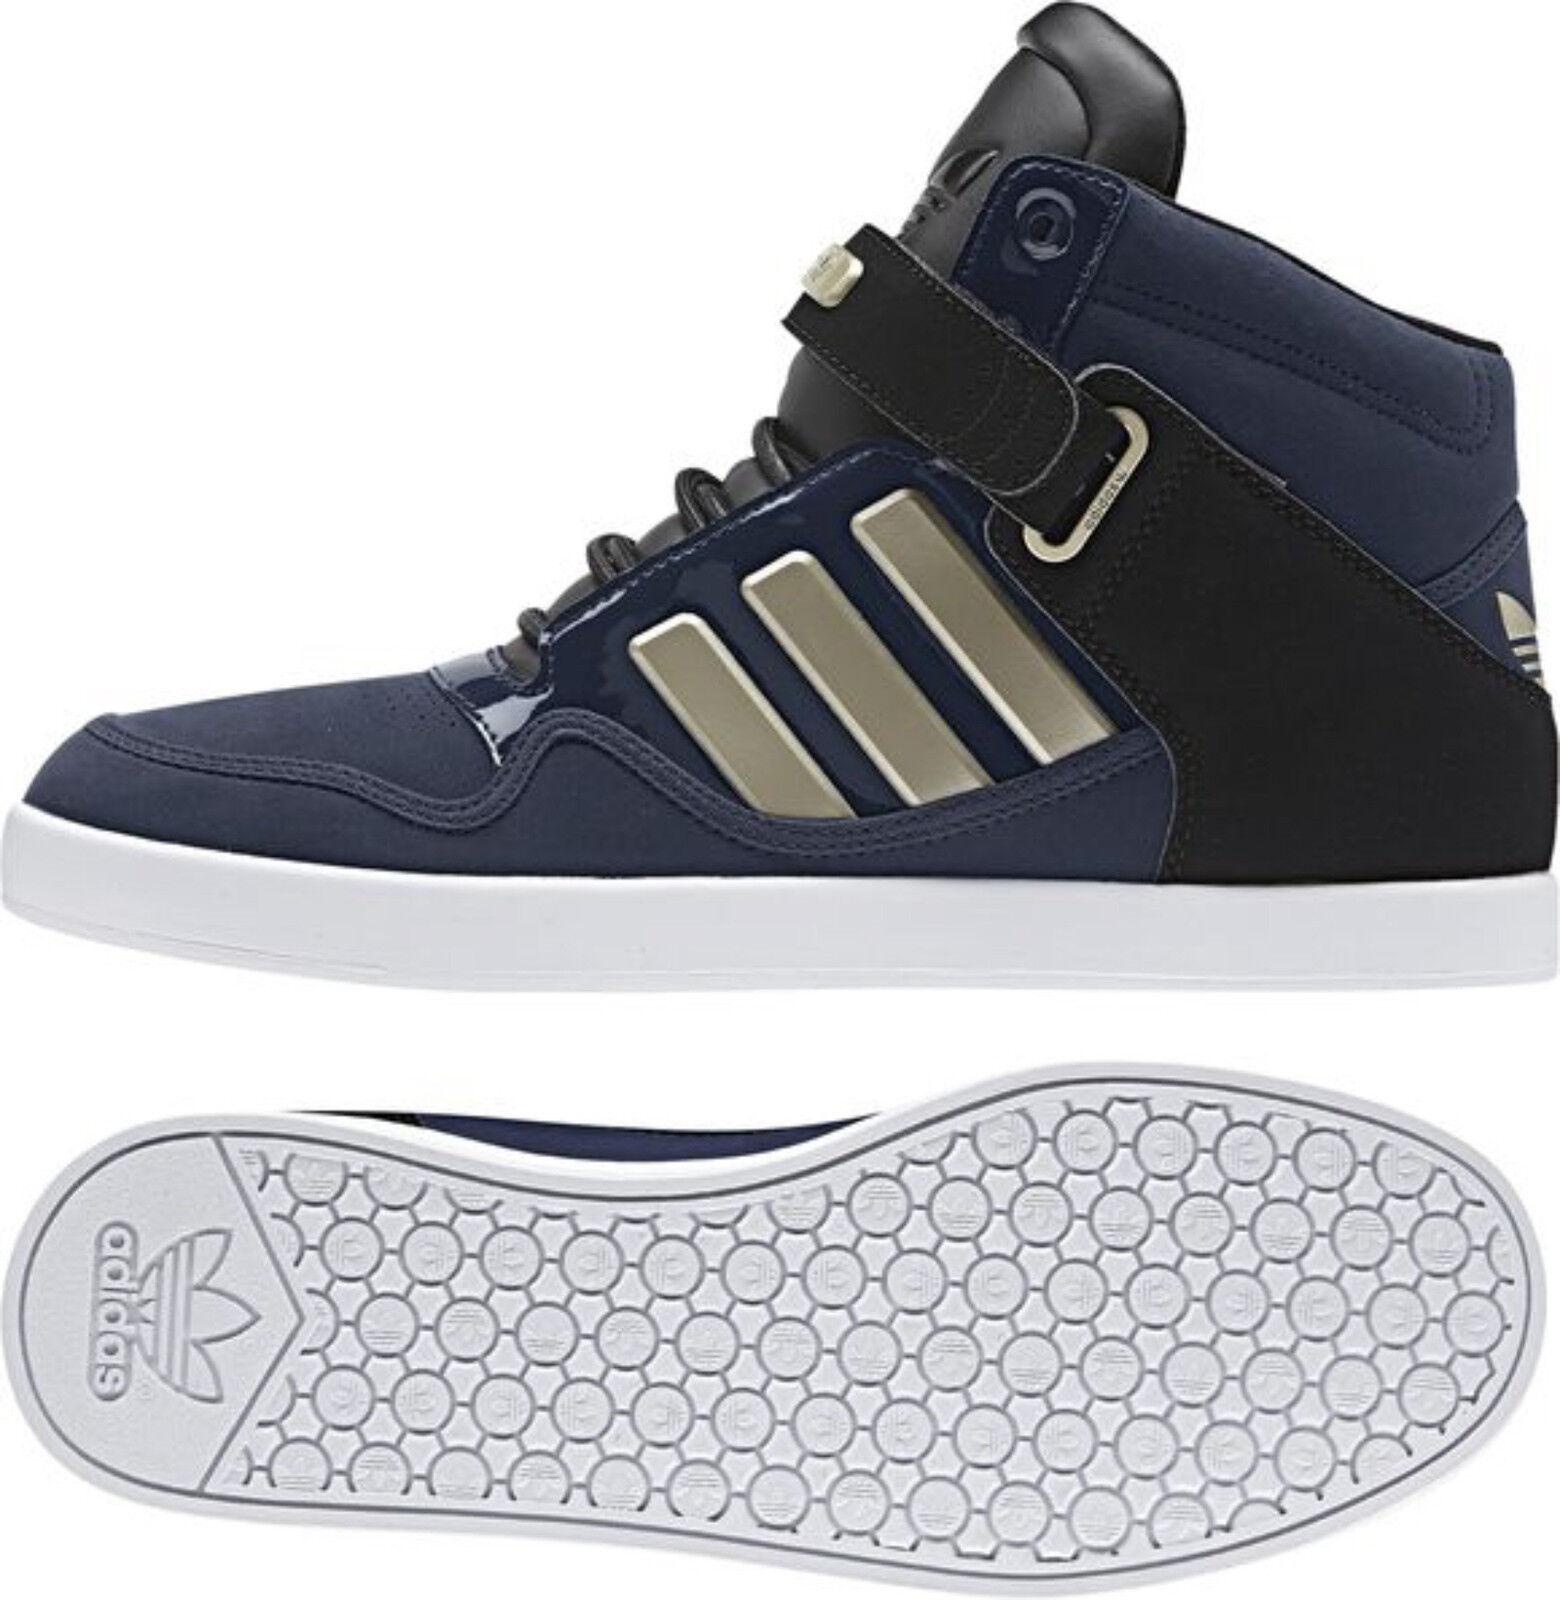 ADIDAS ADIRICE 2.0 navy/beige  M25458  Originals Sneaker ***SONDERPREIS!!